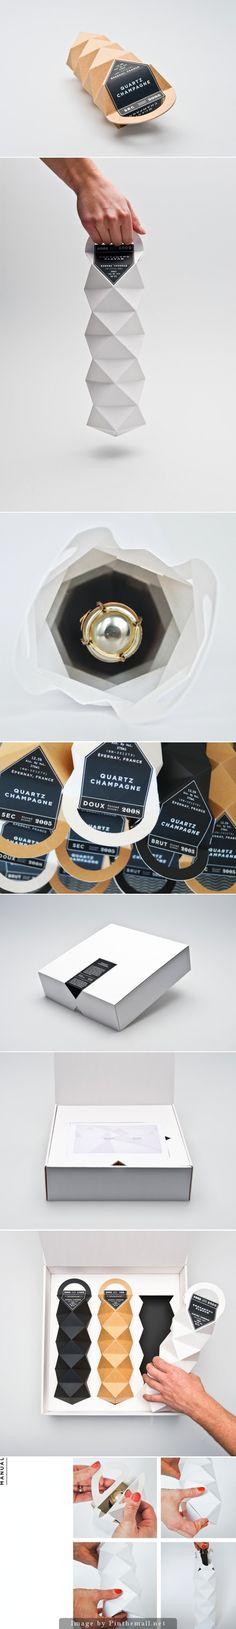 Quartz Champagne (Student Project), Designers: Max Molitor & Cajza Nyden - Packaging design